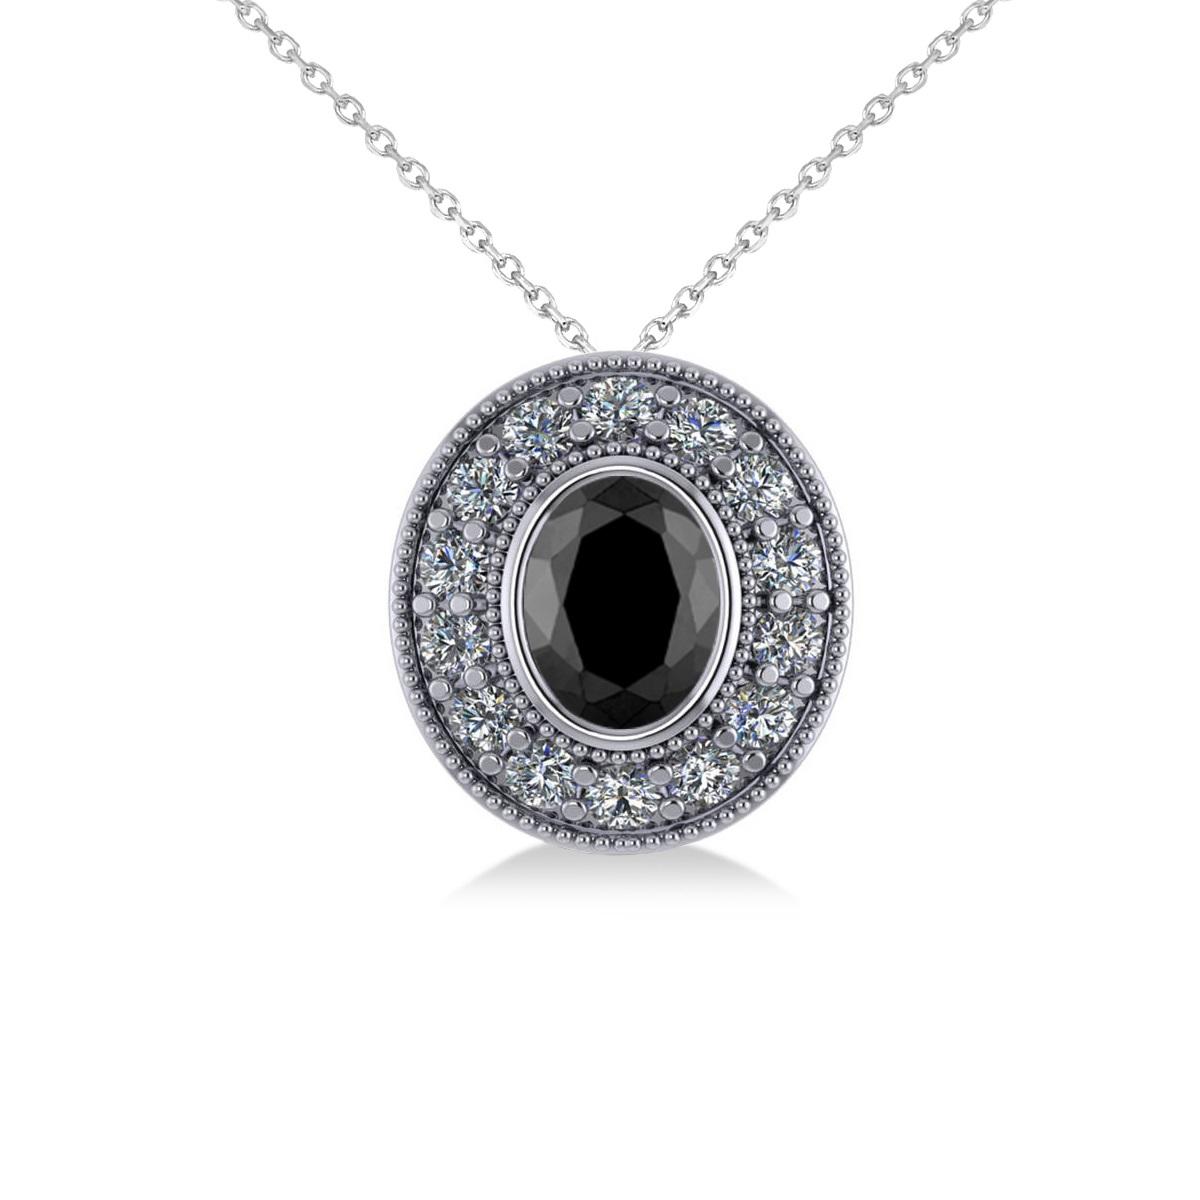 Black Diamond & Diamond Halo Oval Pendant Necklace 14k White Gold (1.18ct)